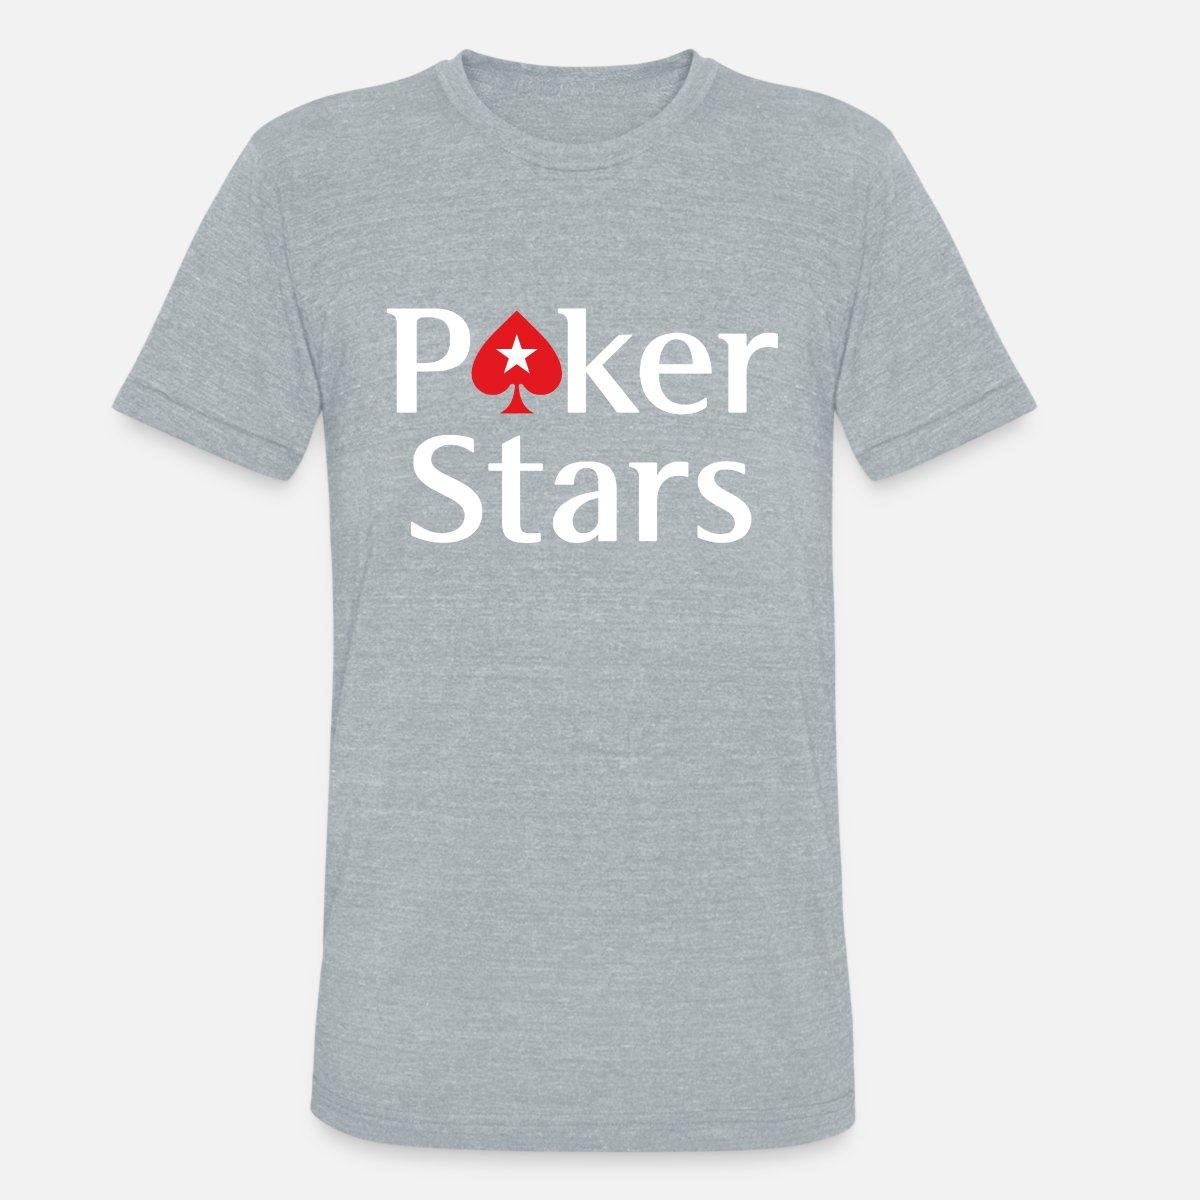 a29152b2 Mens Vintage Polo Shirt Pokerstars - DREAMWORKS